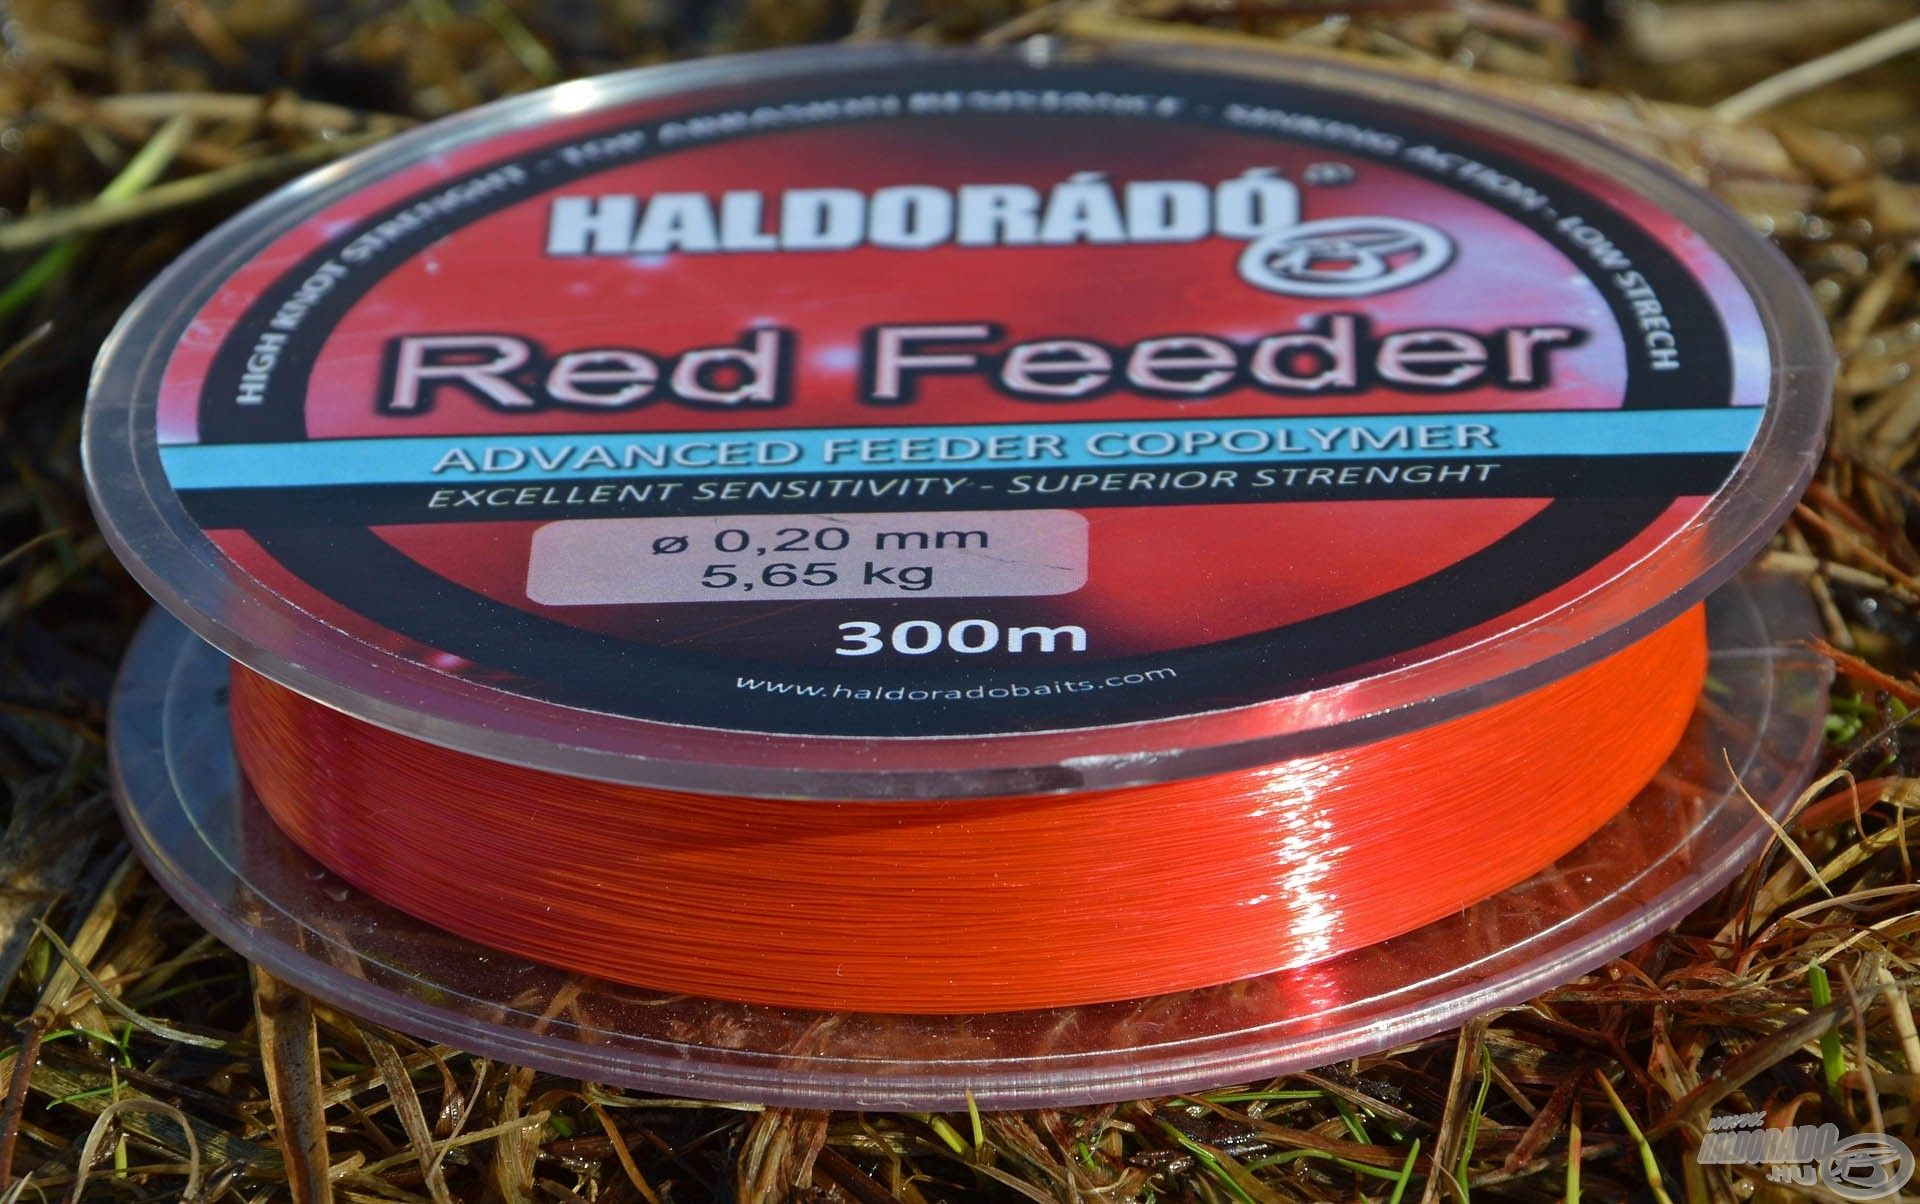 … míg a Red Feeder piros színű feeder zsinór